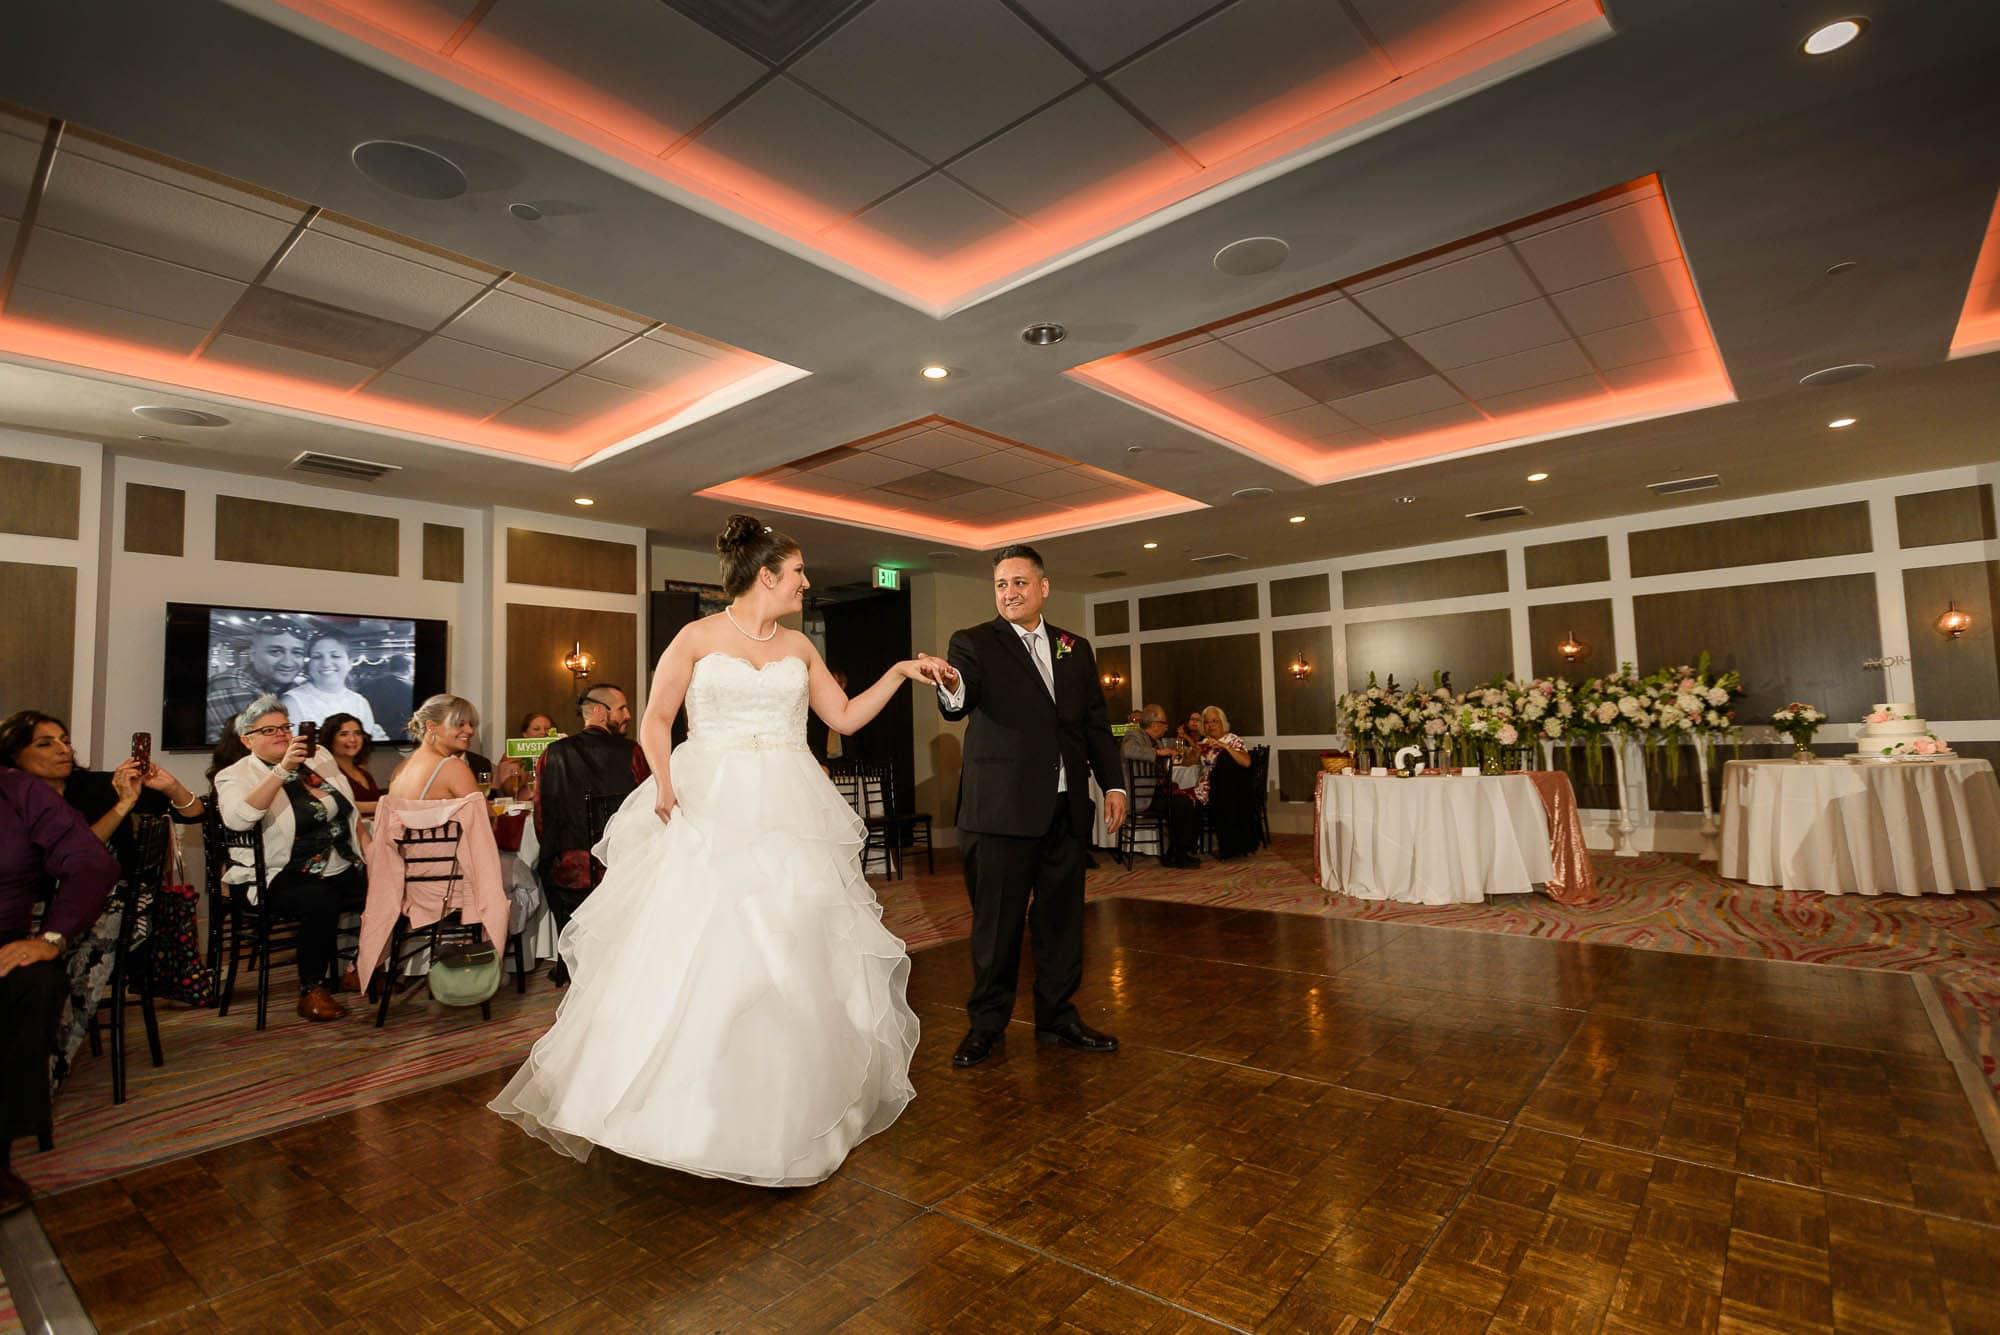 028_Alan_and_Heidi_Wedding_Nicole_Roman